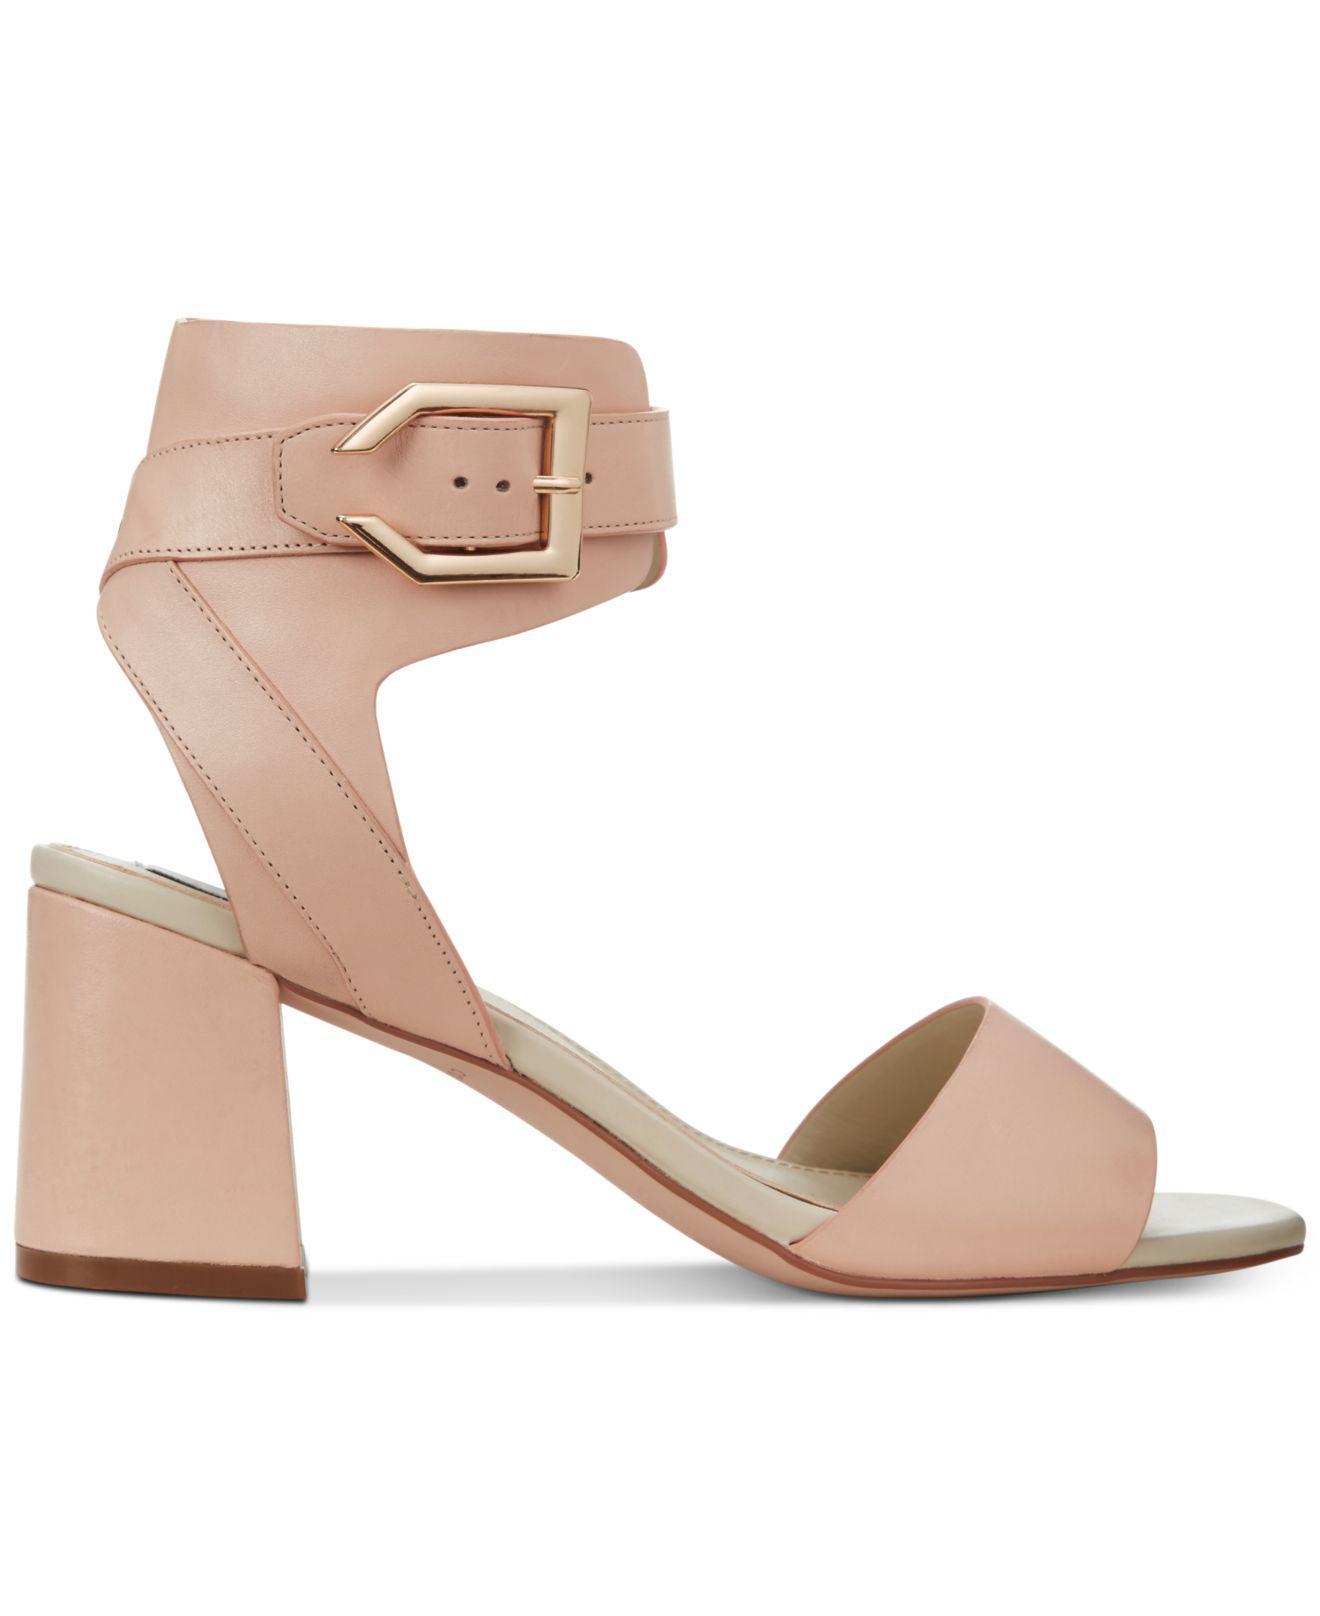 f0d9b5861ae Lyst - Cole Haan Avani Block-heel Sandals